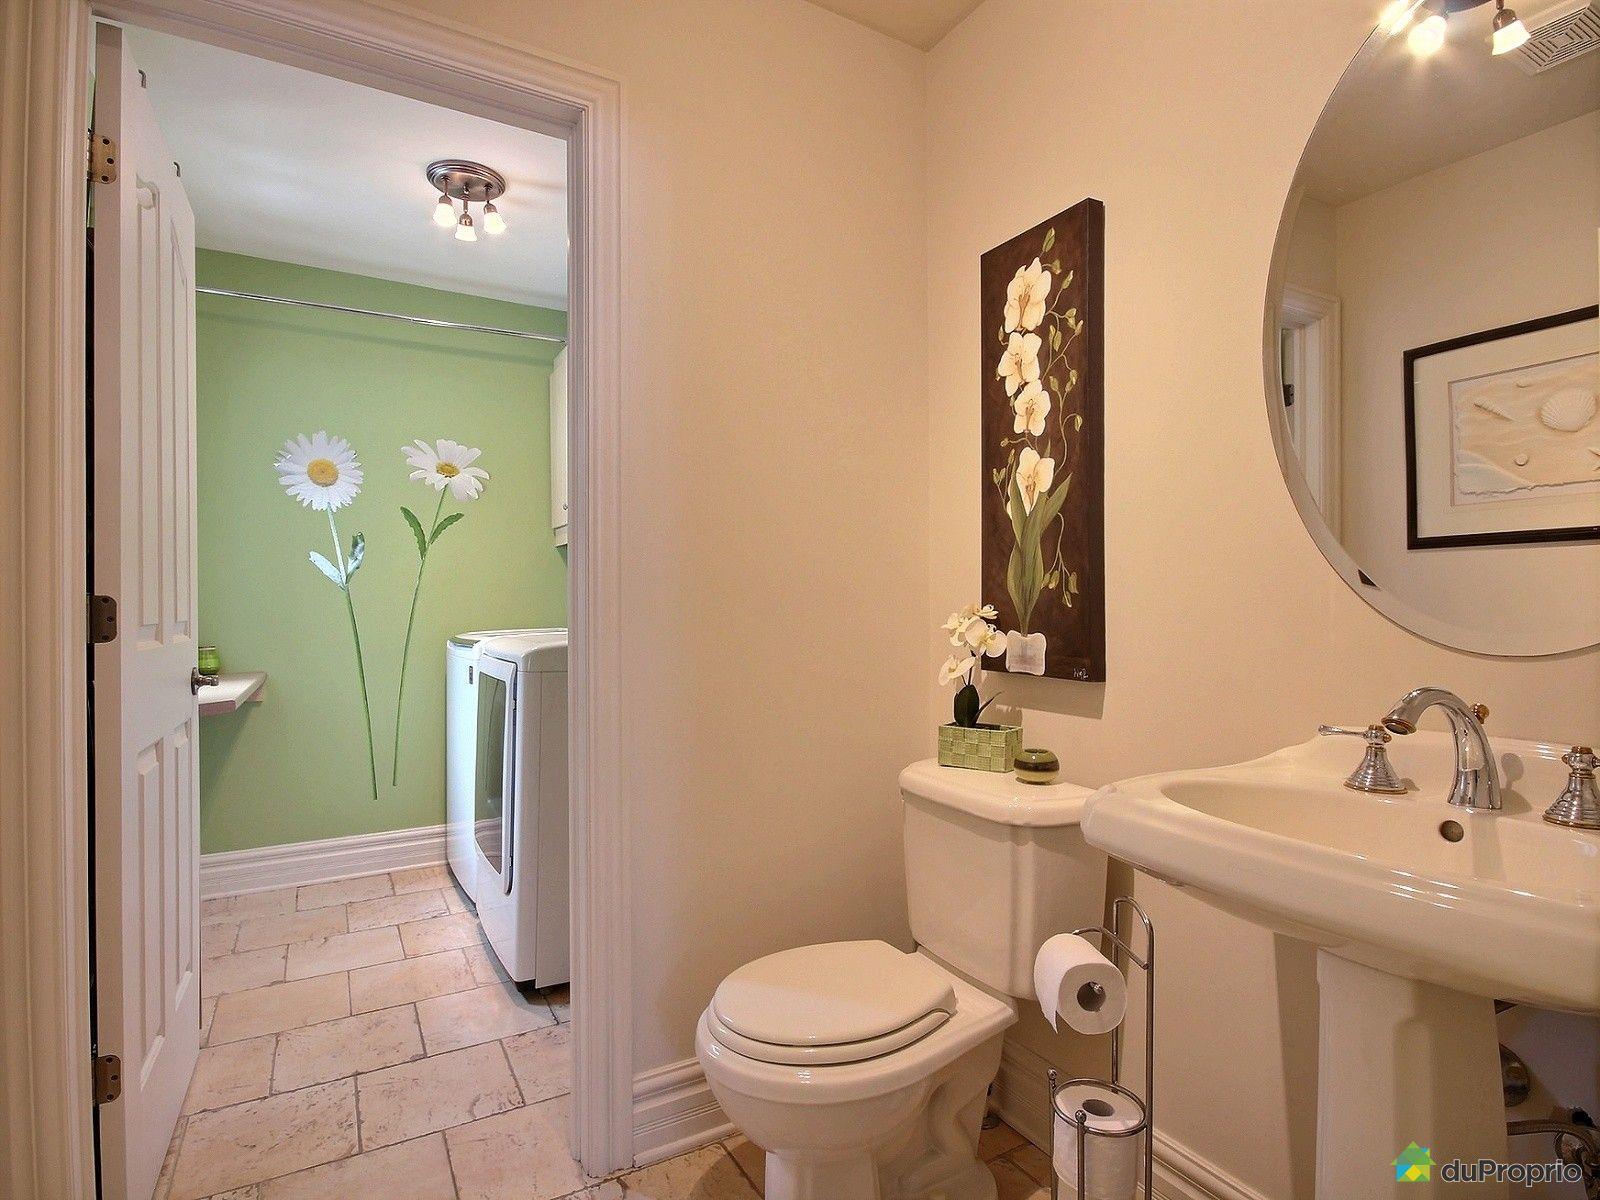 House For Sale In Mirabel En Haut 16825 Rue Du Diamant